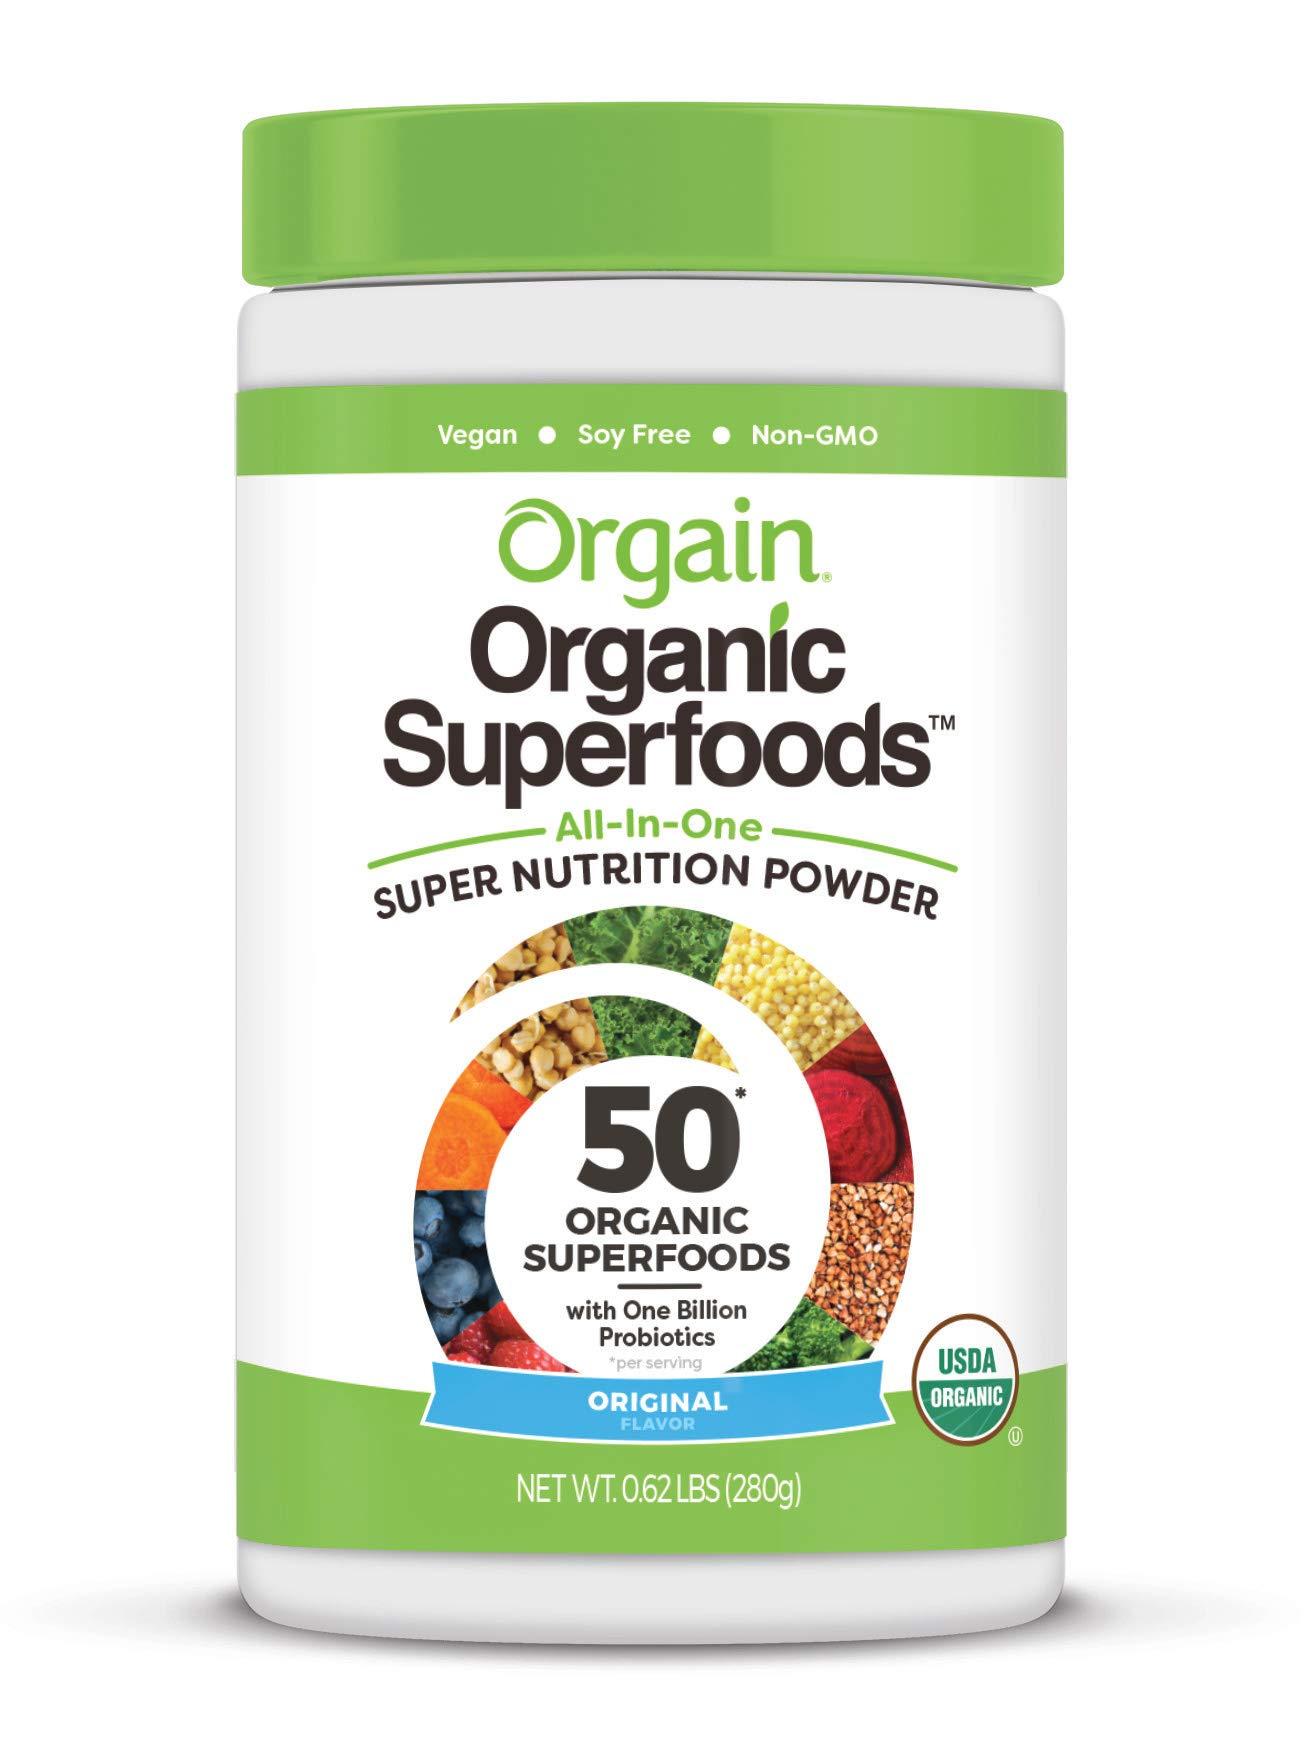 Orgain Organic Green Superfoods Powder, Original - Antioxidants, 1 Billion Probiotics, Vegan, Dairy Free, Gluten Free, Kosher, Non-GMO, 0.62 Pound (Packaging May Vary) by Orgain